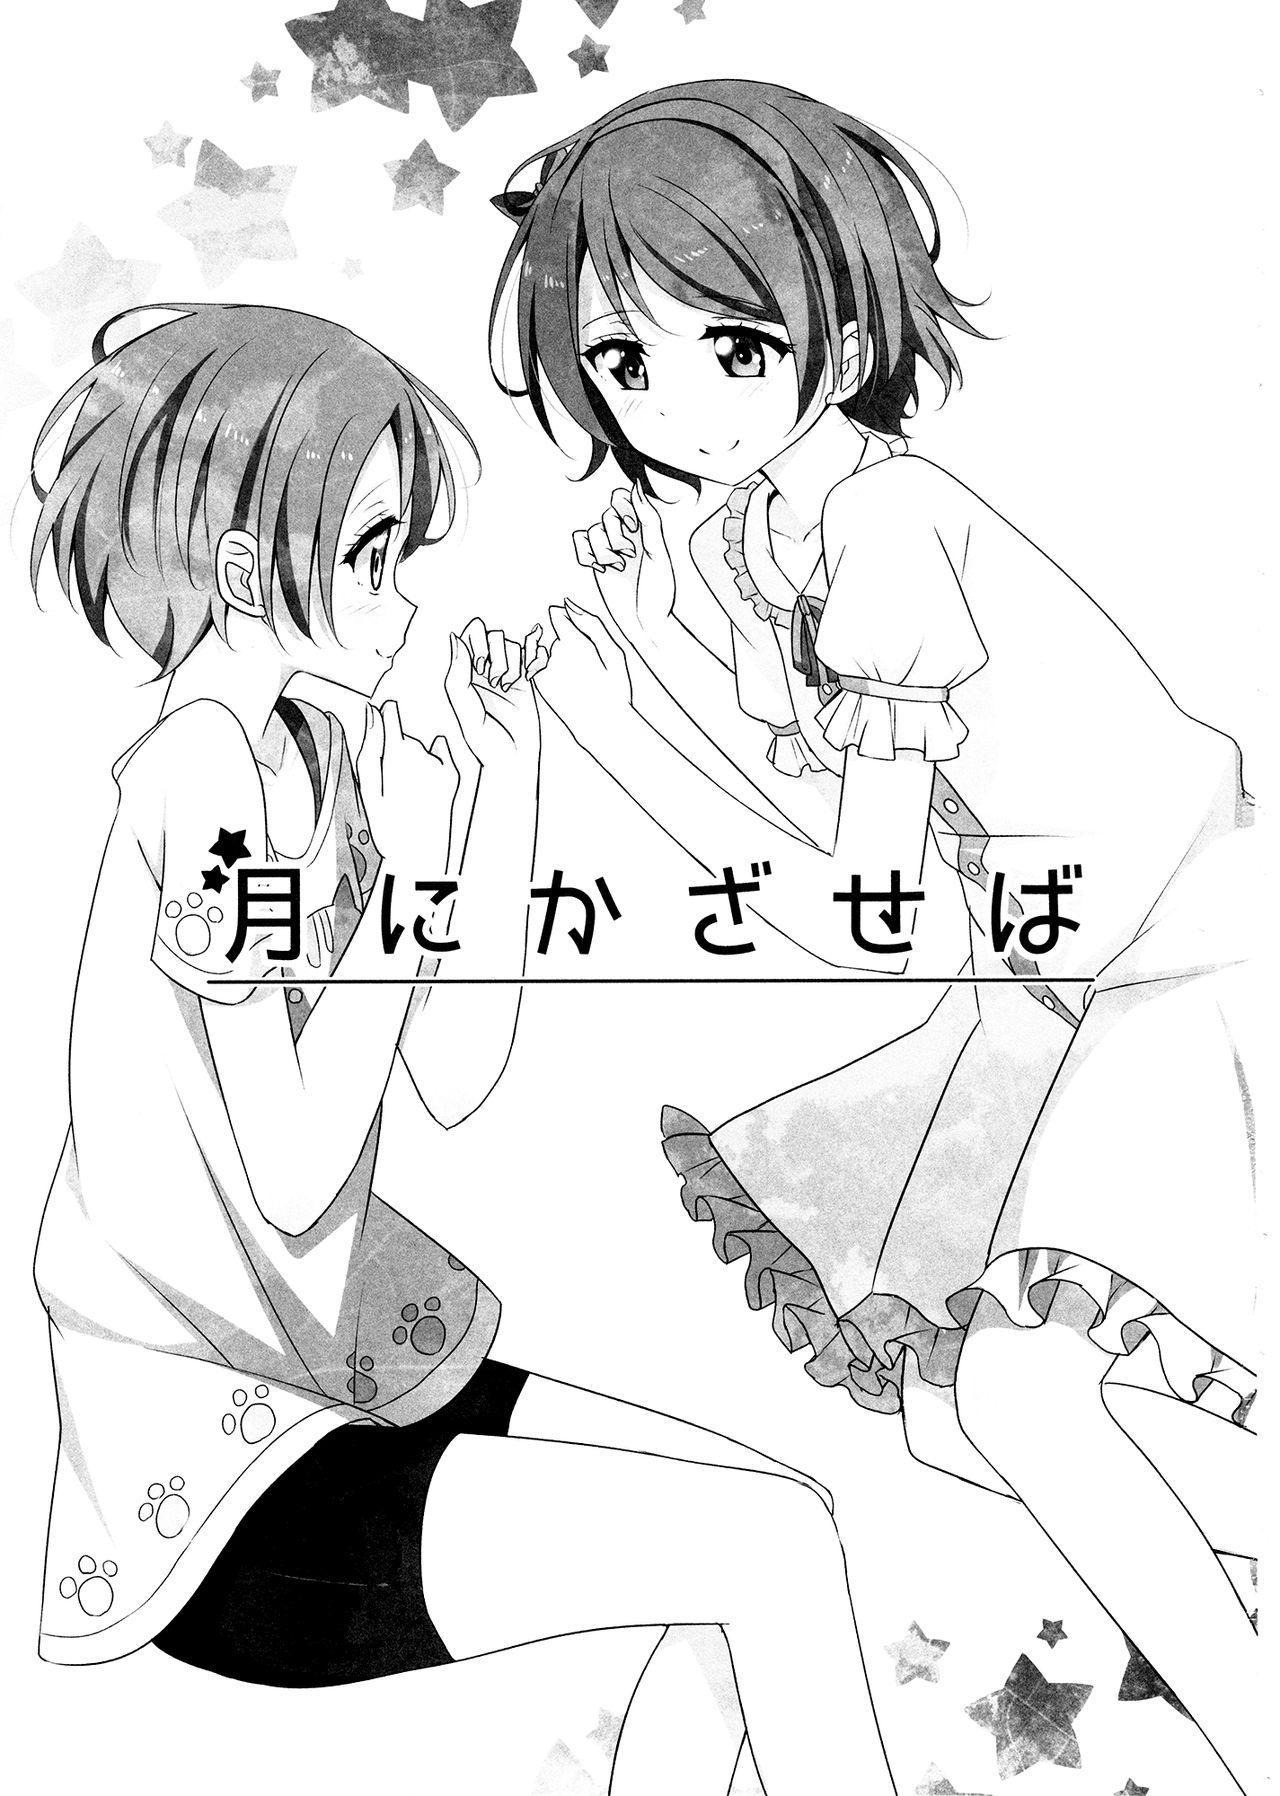 Tsuki ni Kazaseba | Holding You On The Moon 1